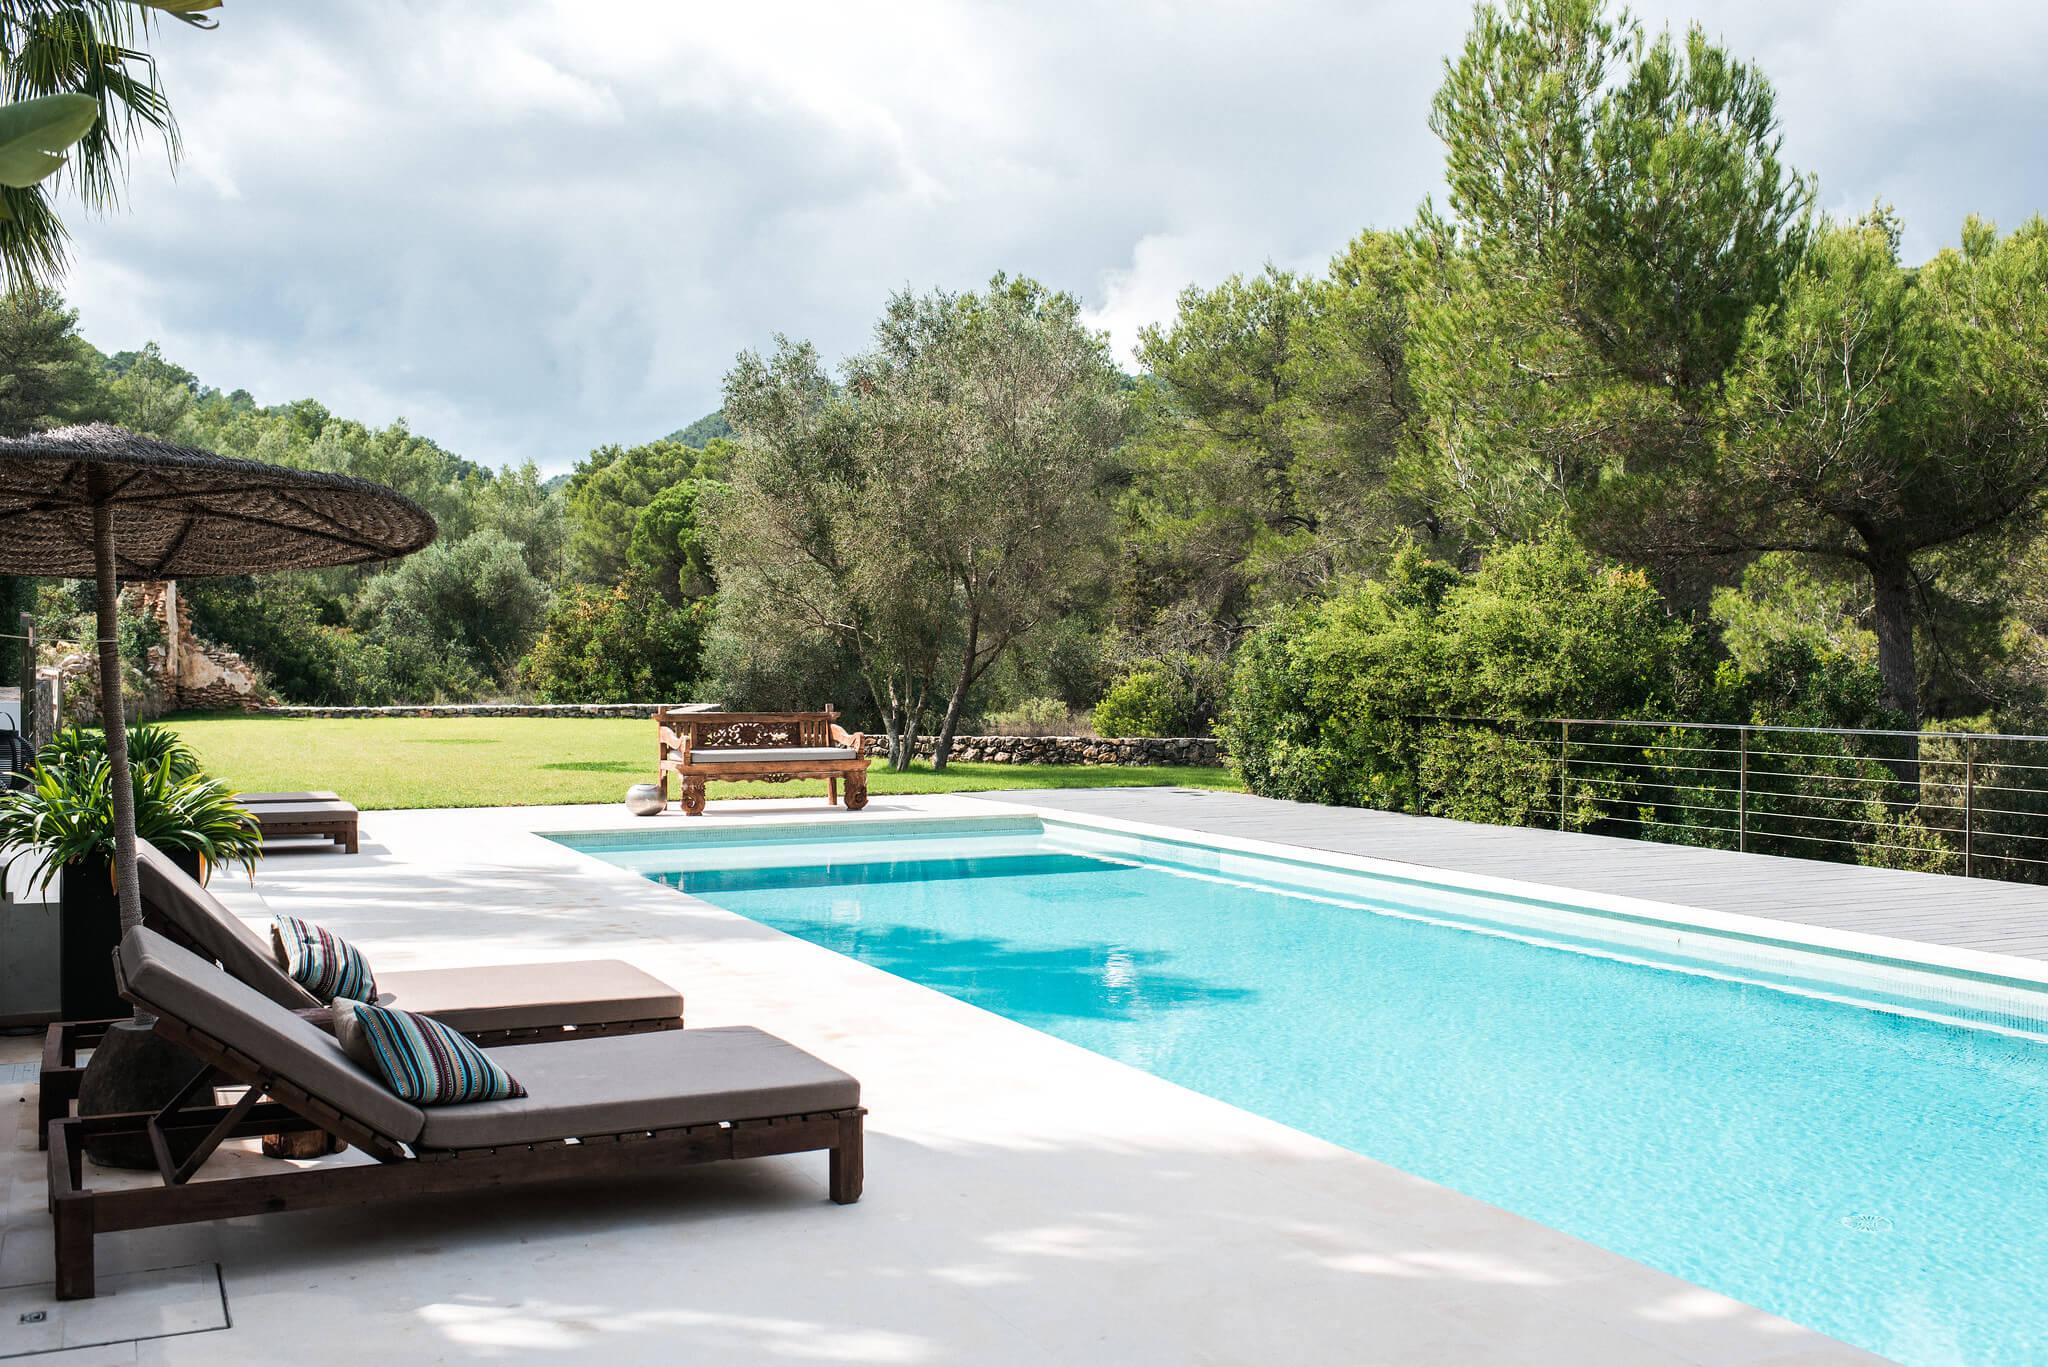 https://www.white-ibiza.com/wp-content/uploads/2020/05/white-ibiza-villas-casa-estrella-exterior-pool2.jpg